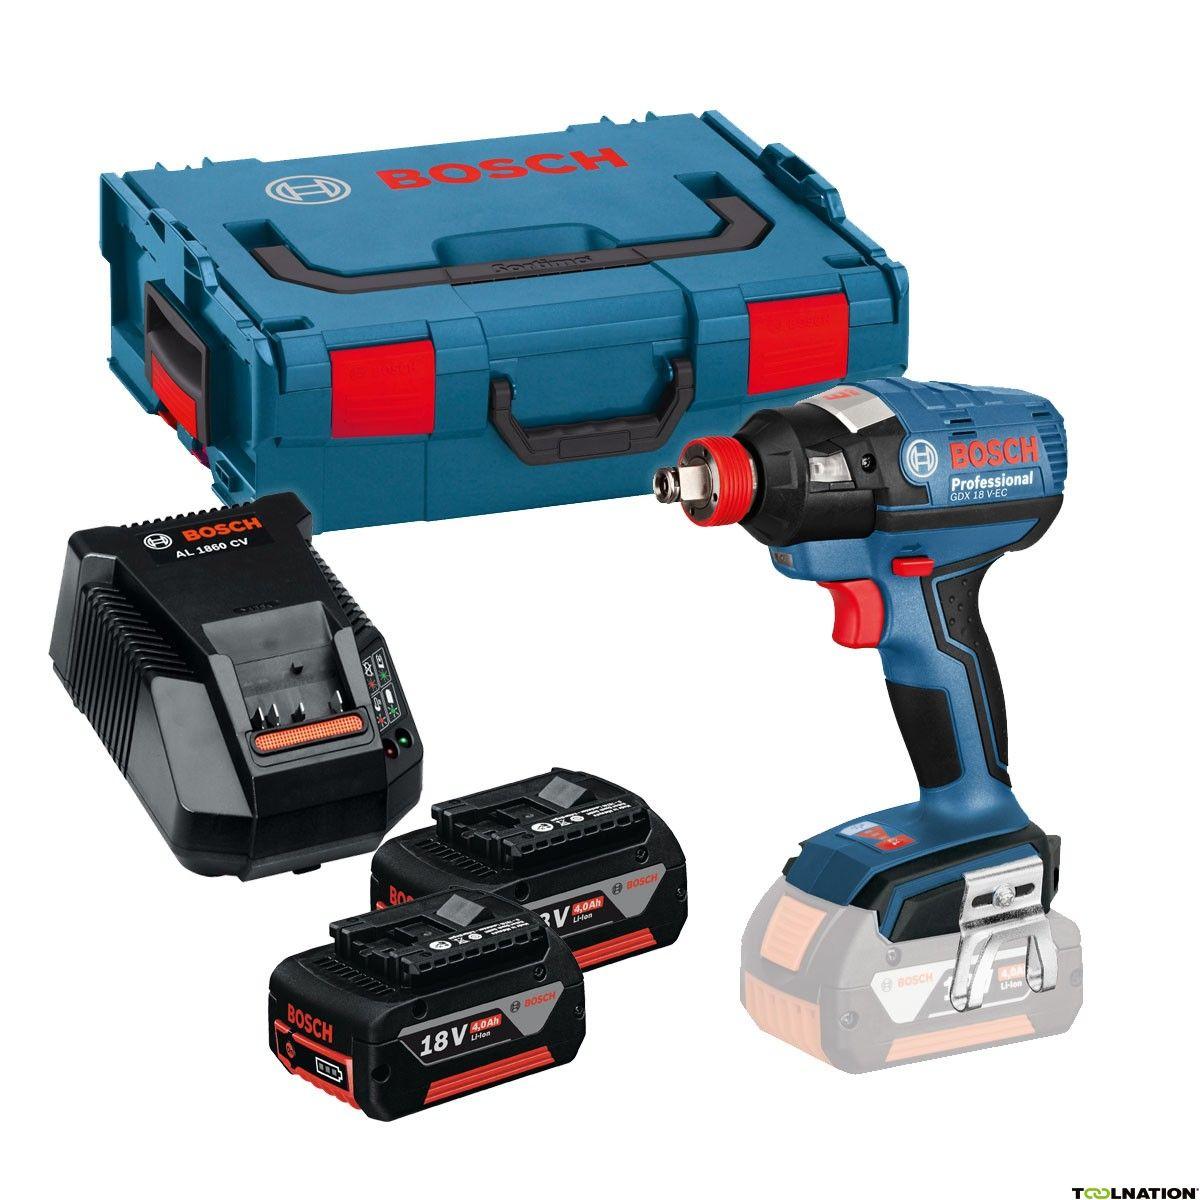 Bosch GDX18V-EC slagmoer/slagschroefmachine 18 Volt 4.0 AH Li-ion in L-Boxx 06019B9100 + 5 jaar dealer garantie!